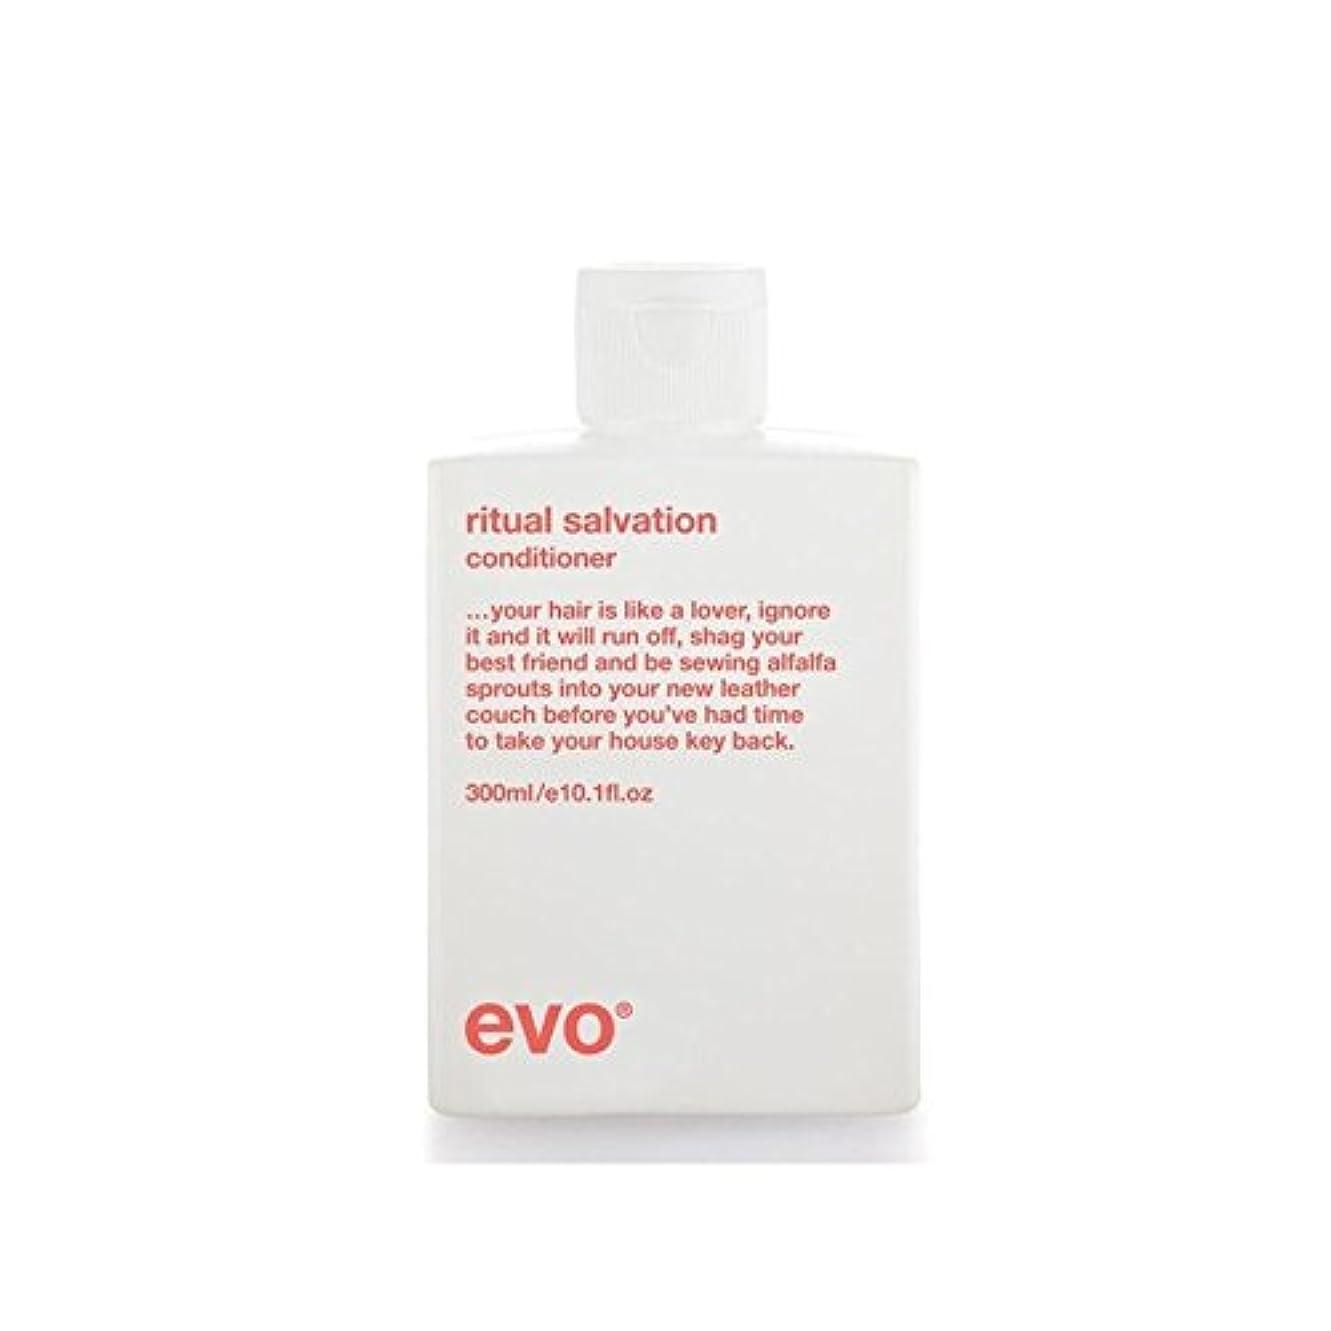 Evo Ritual Salvation Conditioner (300ml) - 儀式救いコンディショナー(300ミリリットル) [並行輸入品]